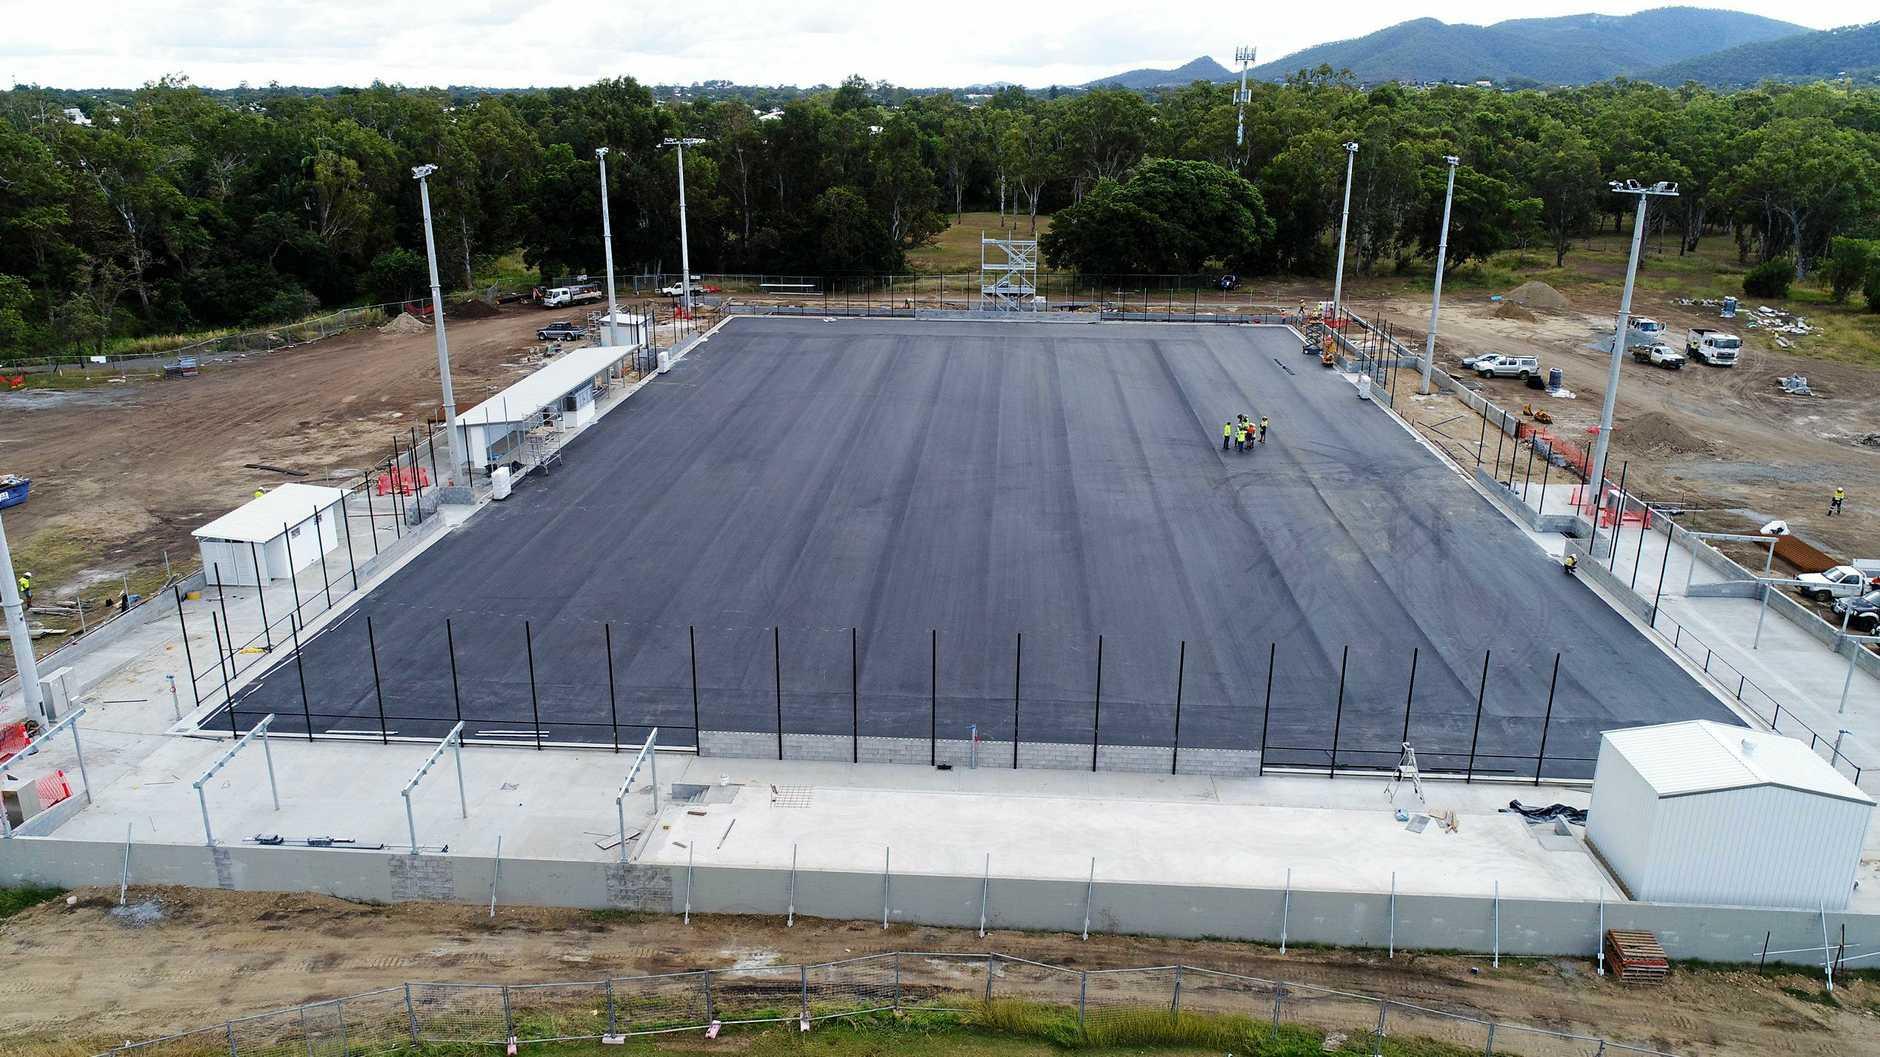 Work on the new hockey field at Kalka Shades.